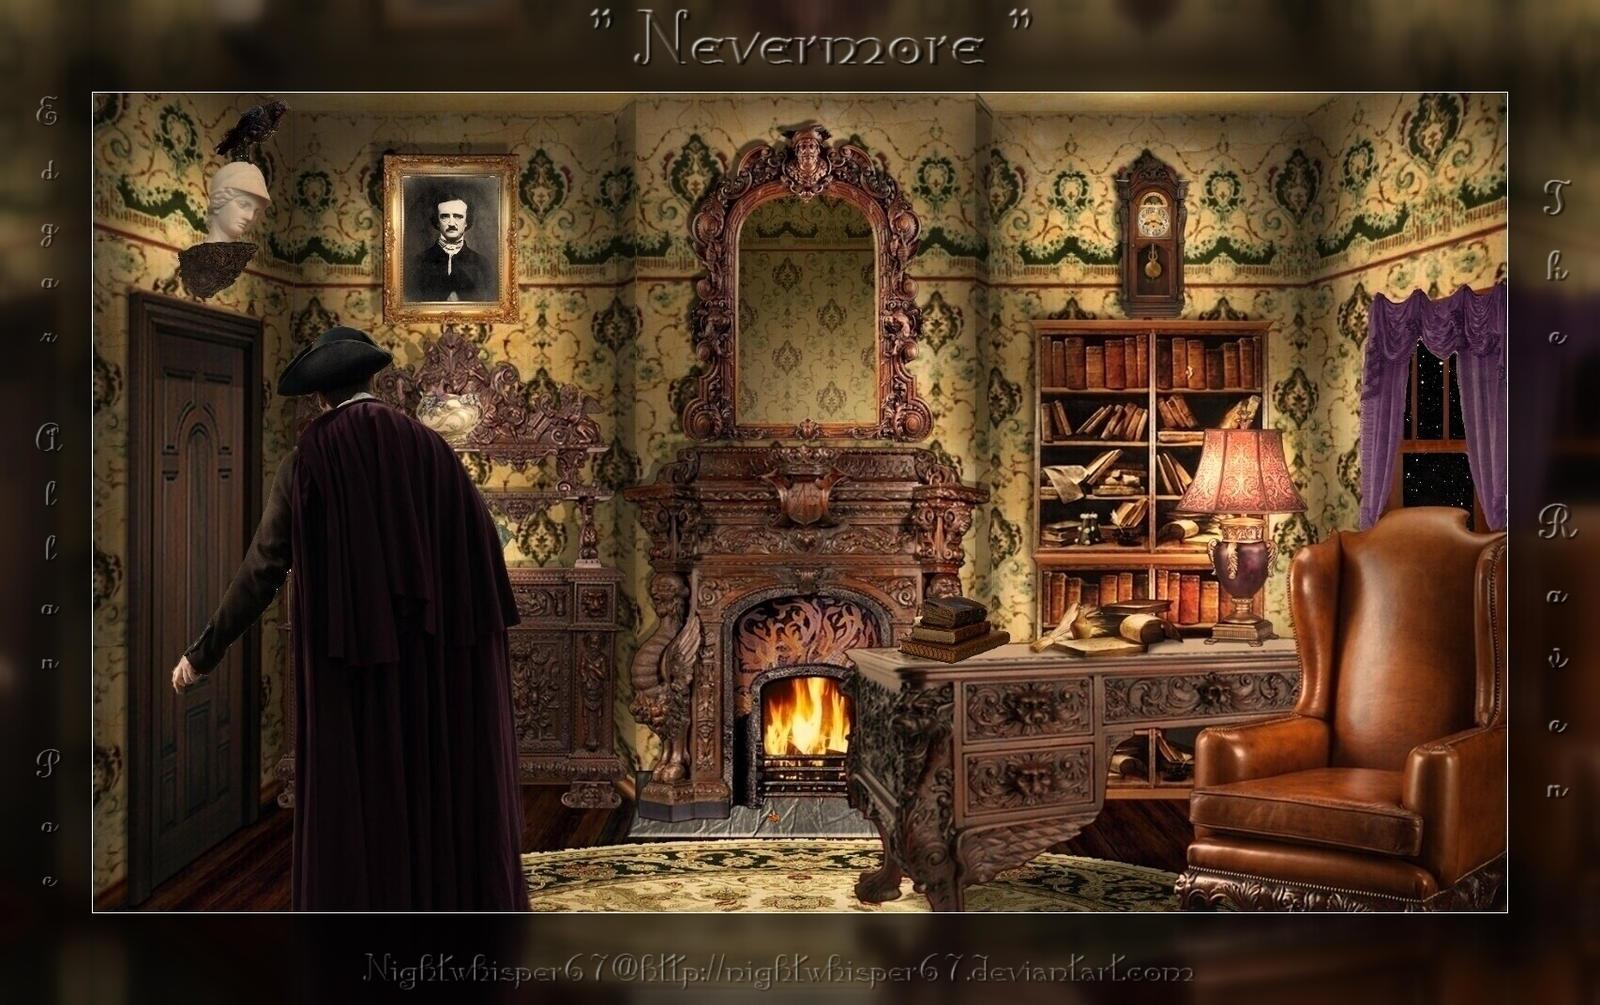 Nevermore by NightWhisper67